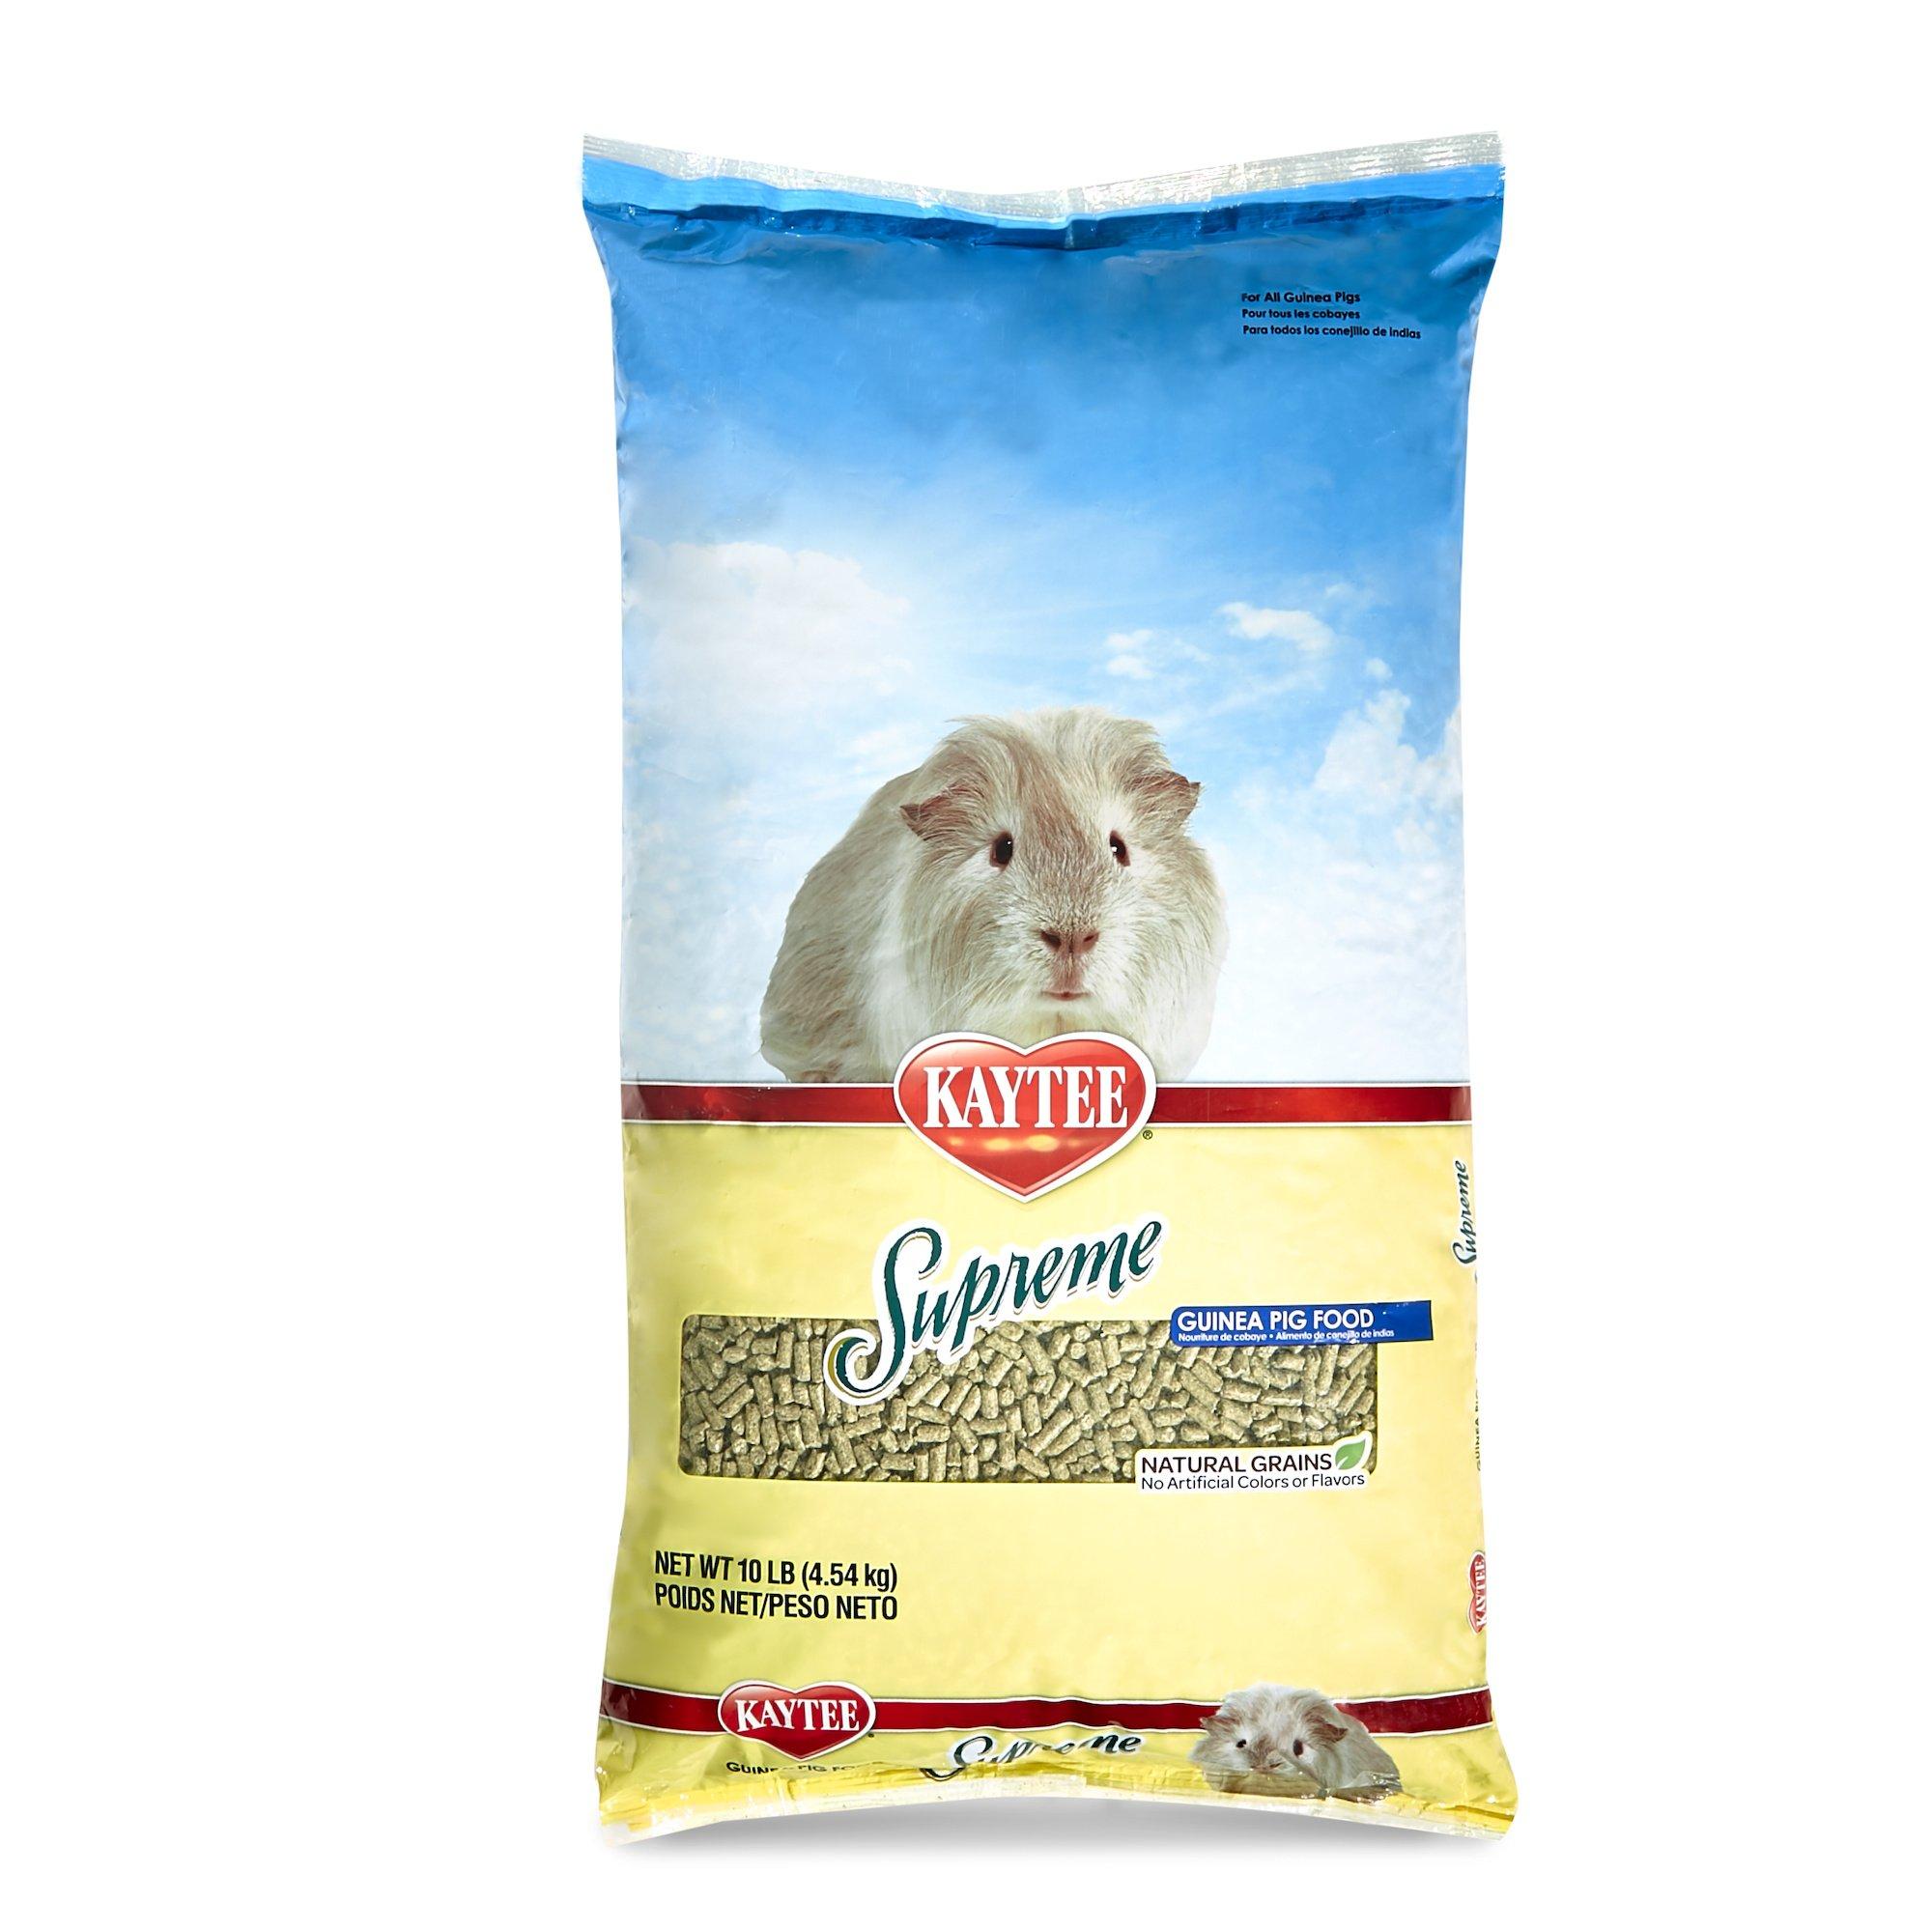 Kaytee Supreme Guinea Pig Food, 10lb